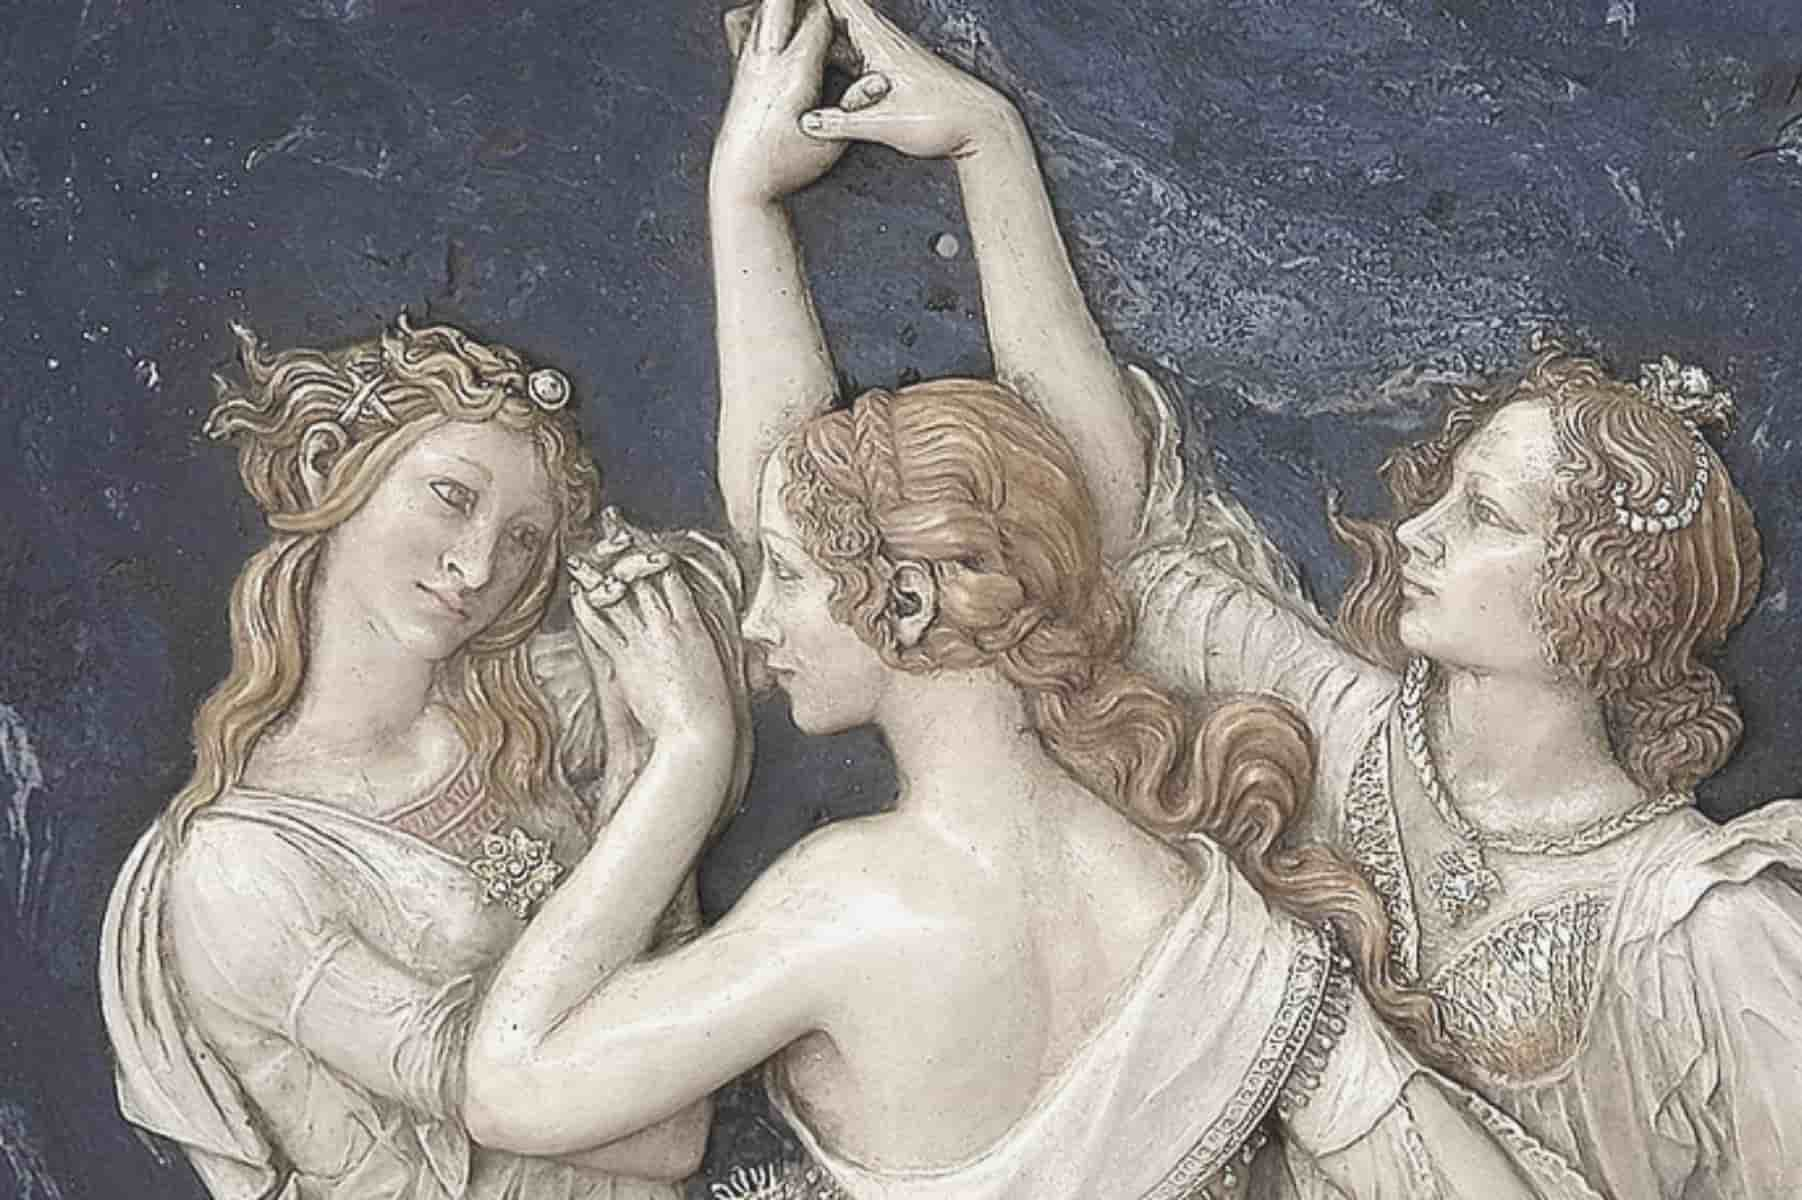 Arquétipo das deusas virgens